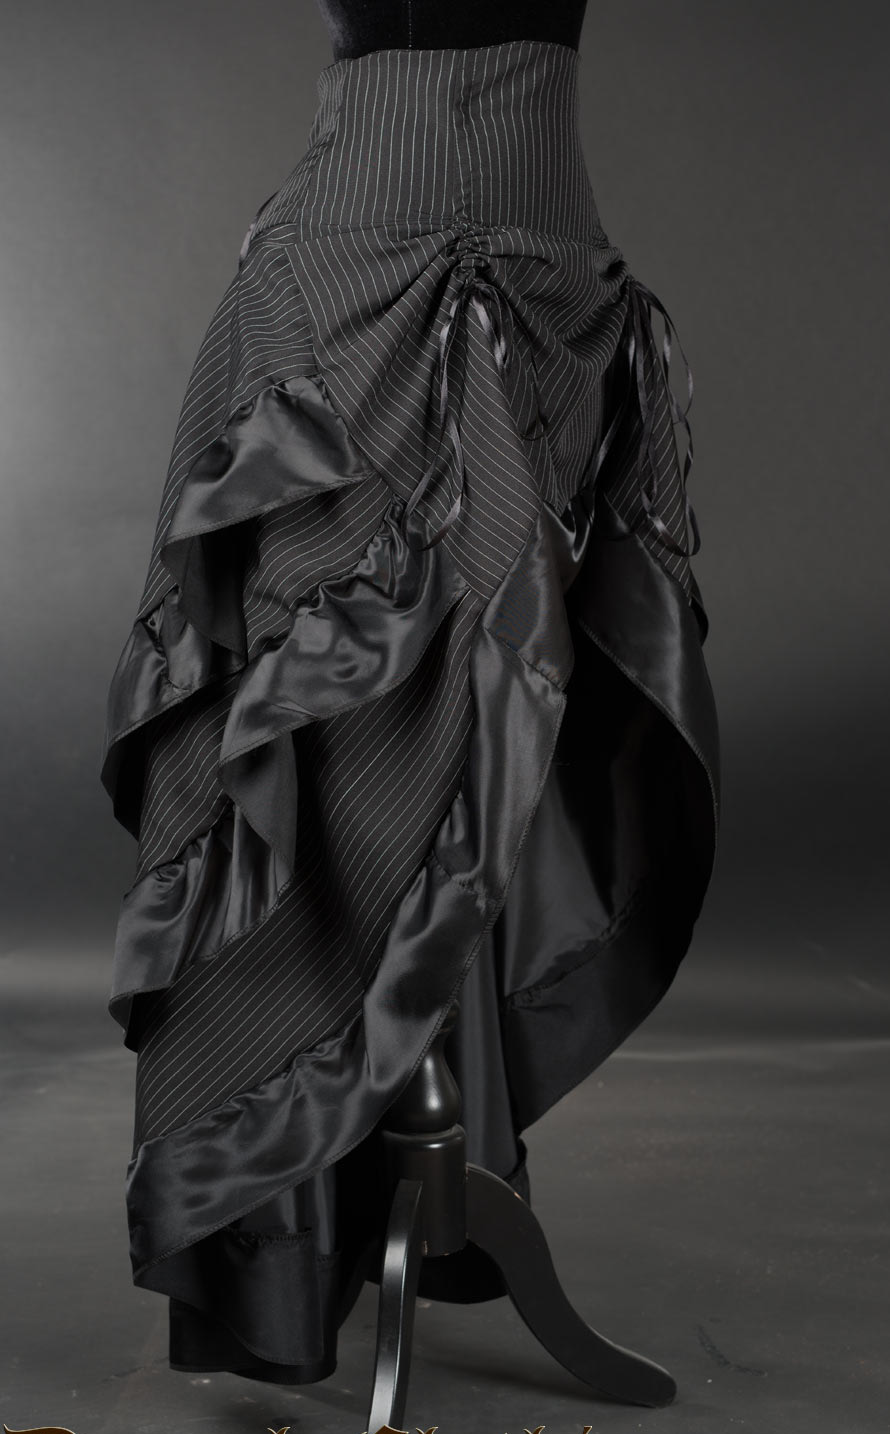 rebelsmarket_black_white_pinstripe_adjustable_long_bustle_3_layer_victorian_goth_skirt__skirts_2.jpg